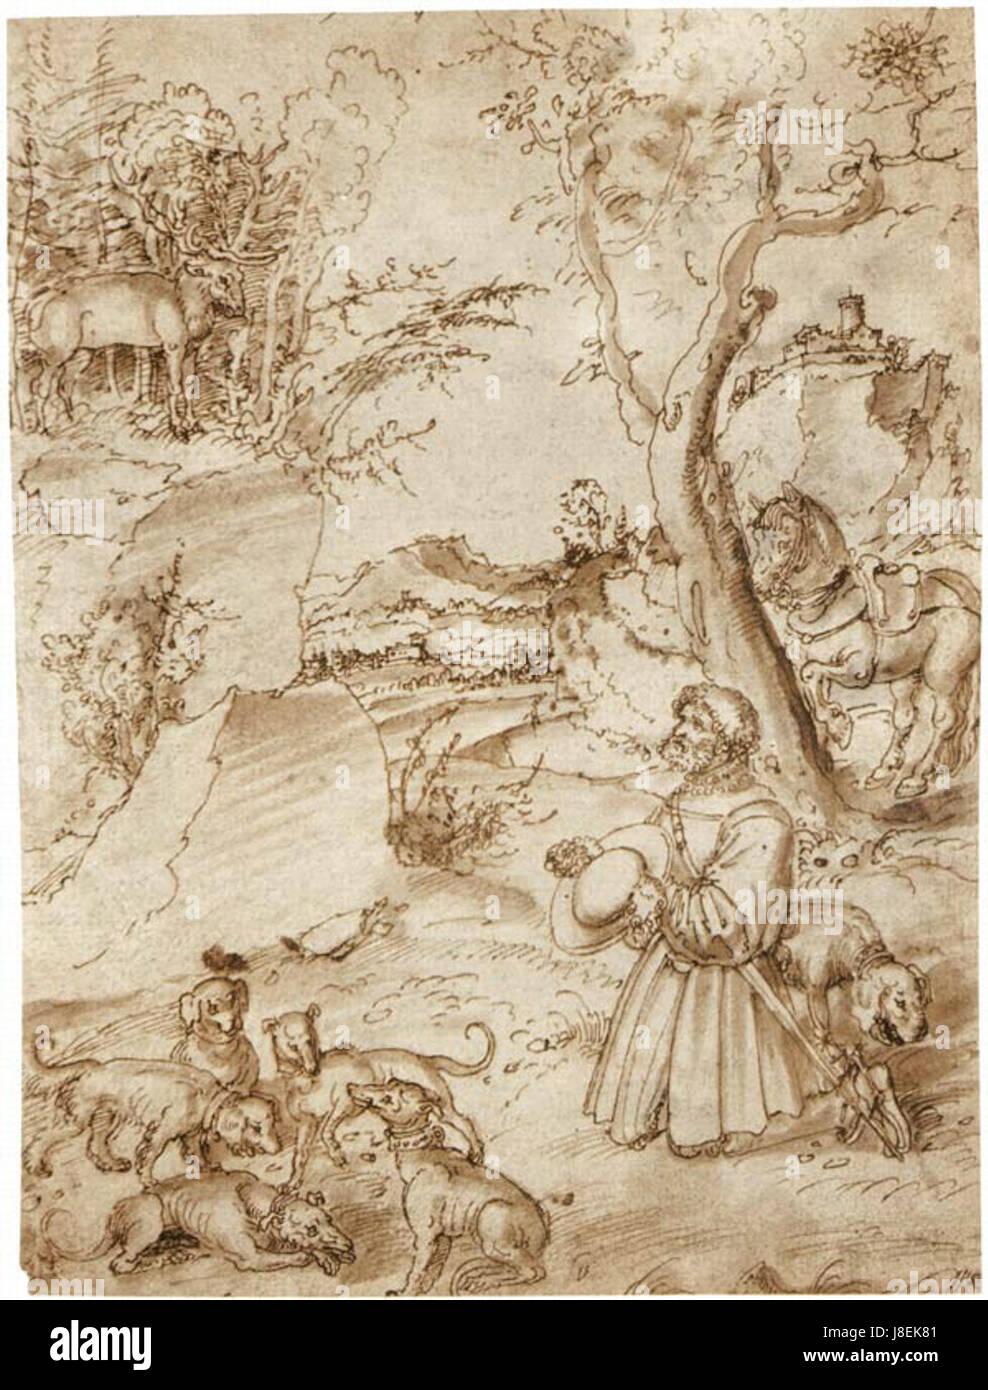 Lucas Cranach St Eustace drawing - Stock Image